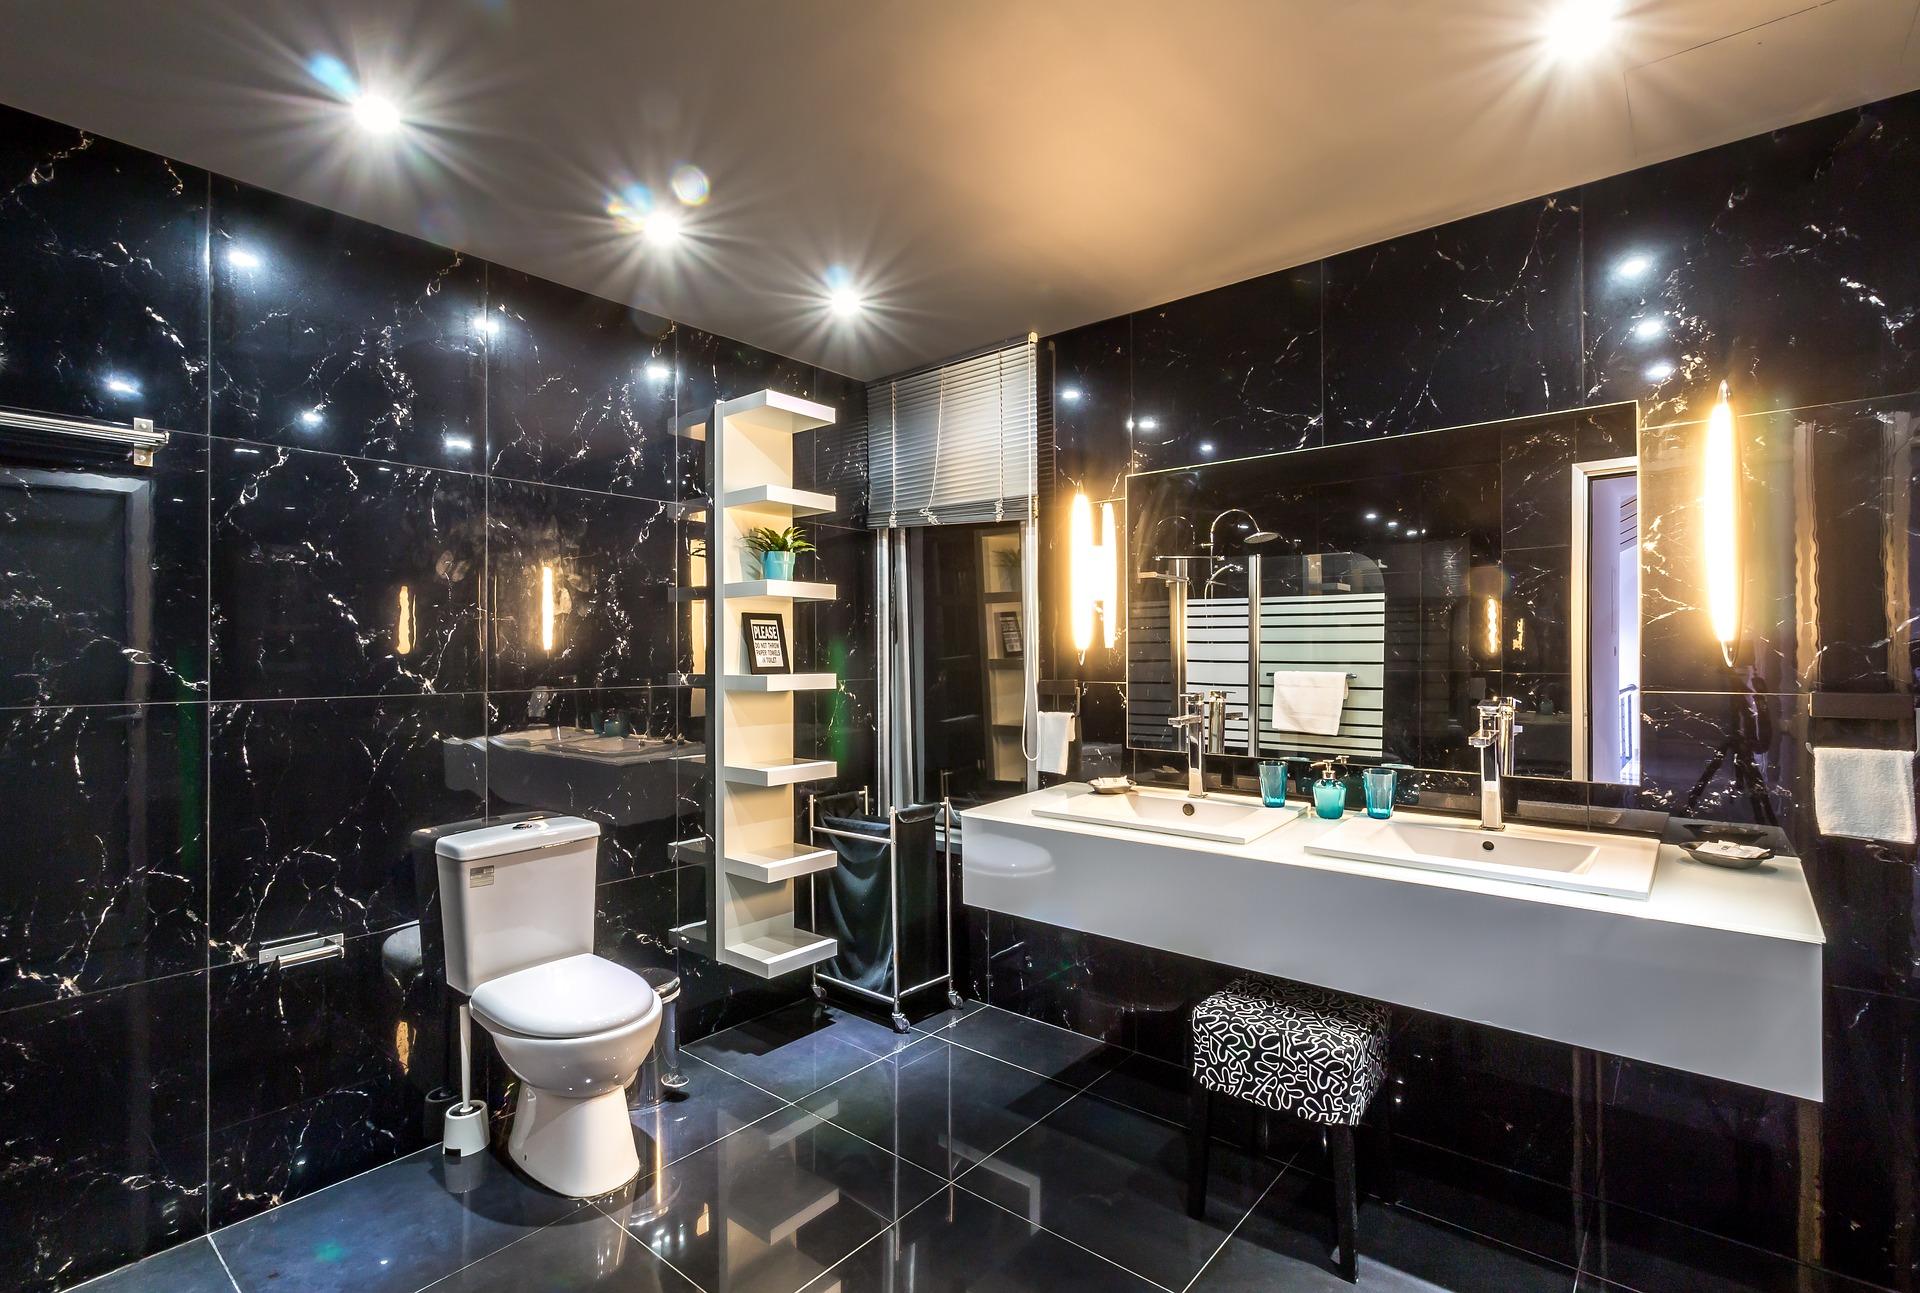 Carrelage Salle De Bain Noir Brillant carrelage noir dans une salle de bain : ce n'est pas une si